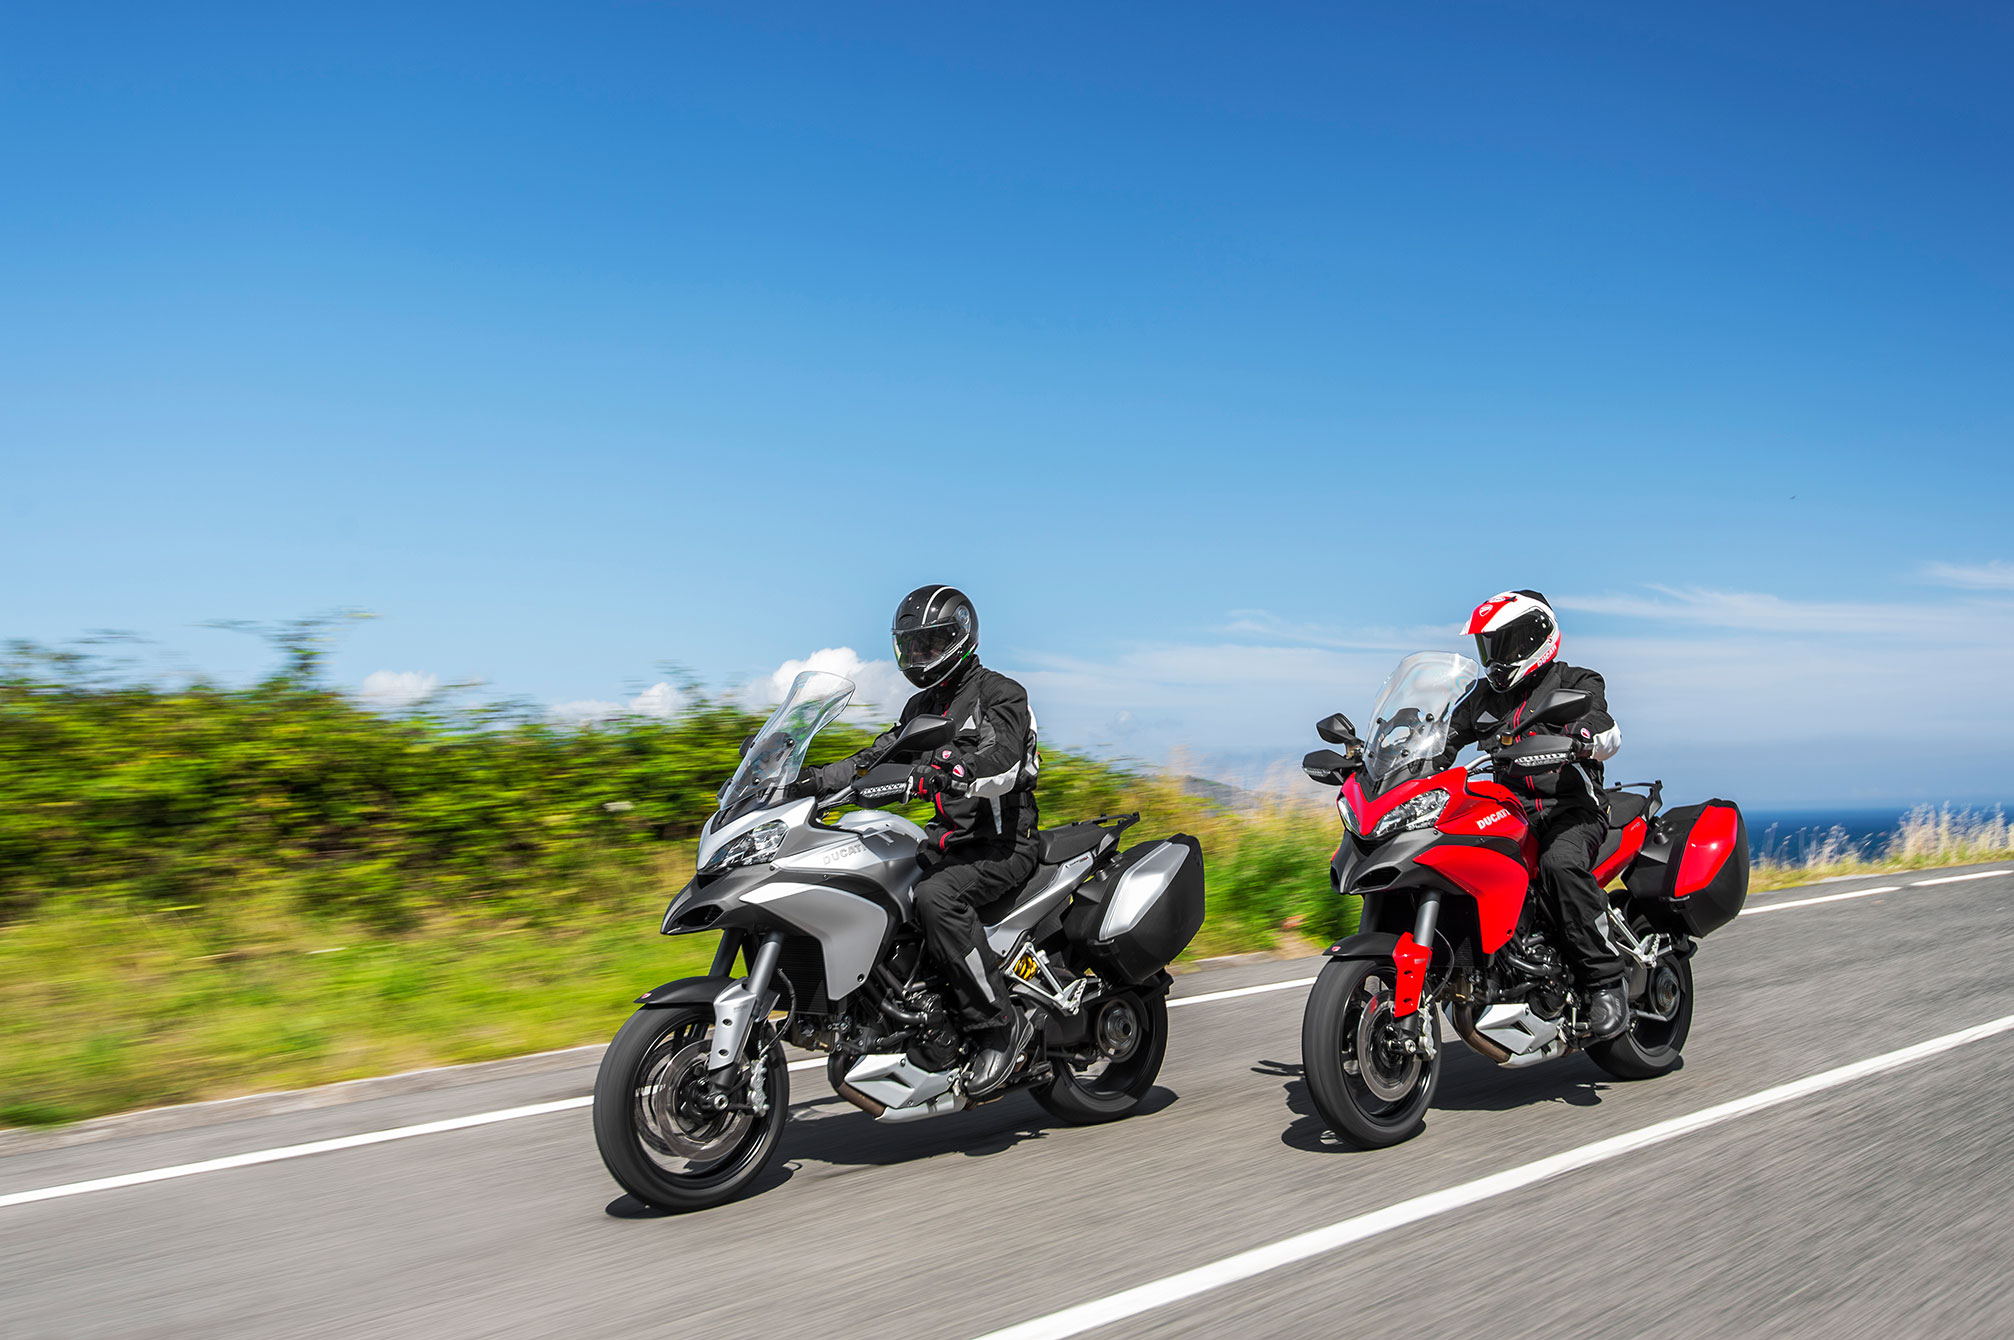 Ducati Multistrada S Touring Specs